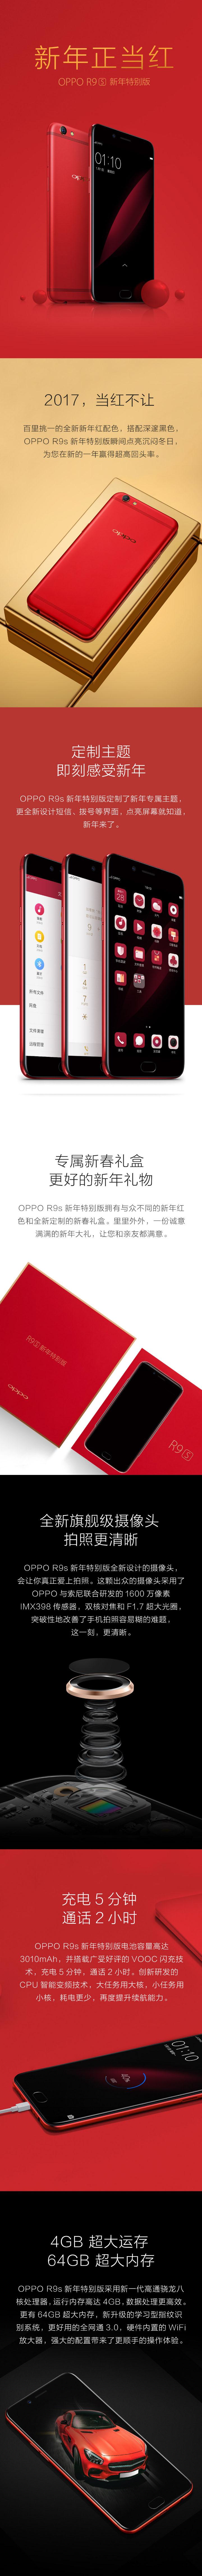 OPPO R9s新年特别版免费试用,评测